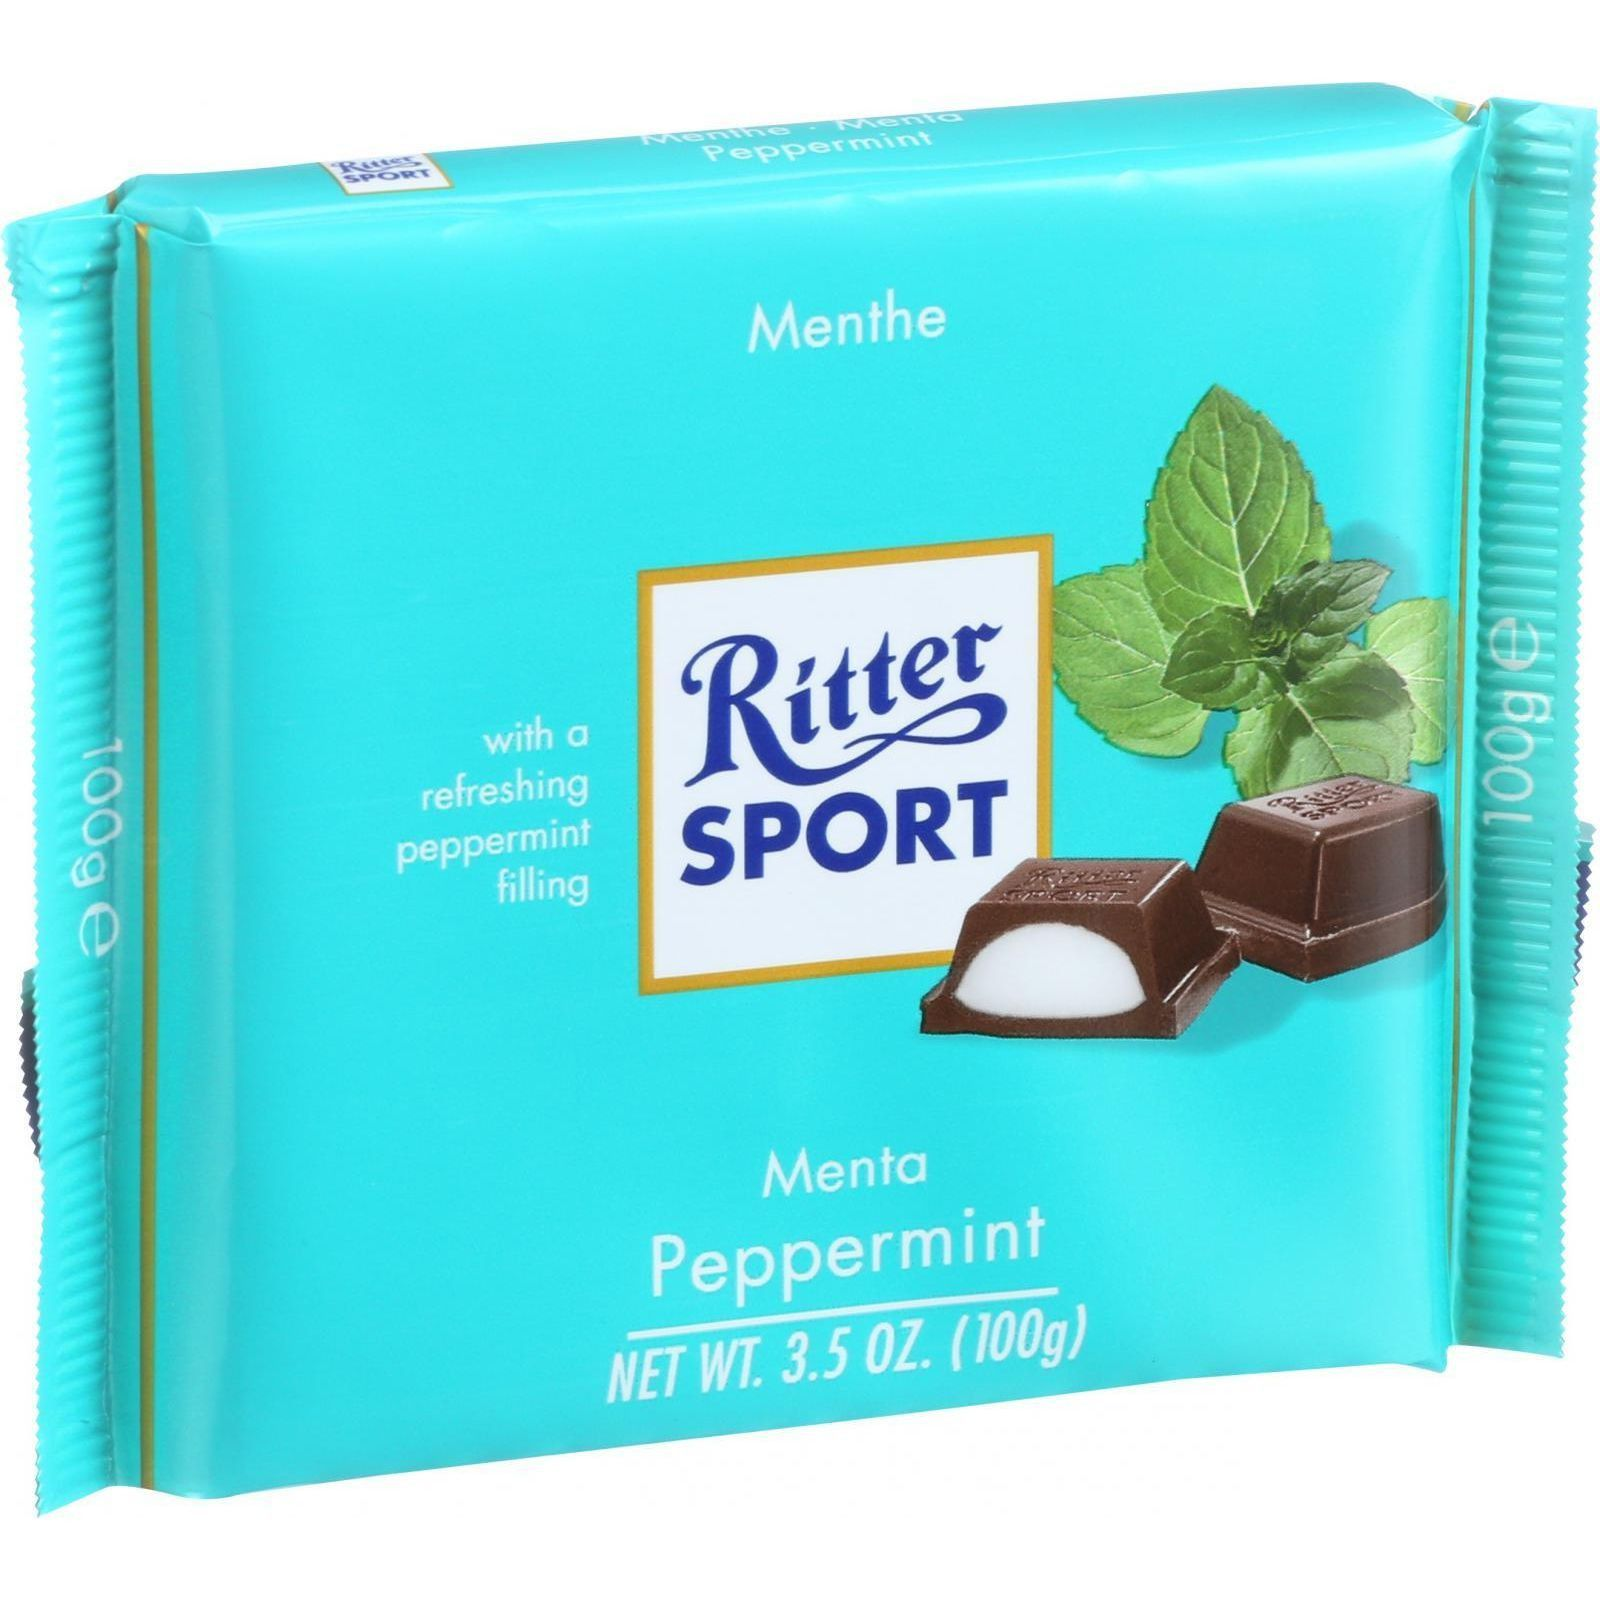 Ritter Sport Chocolate Bar Dark Chocolate Peppermint